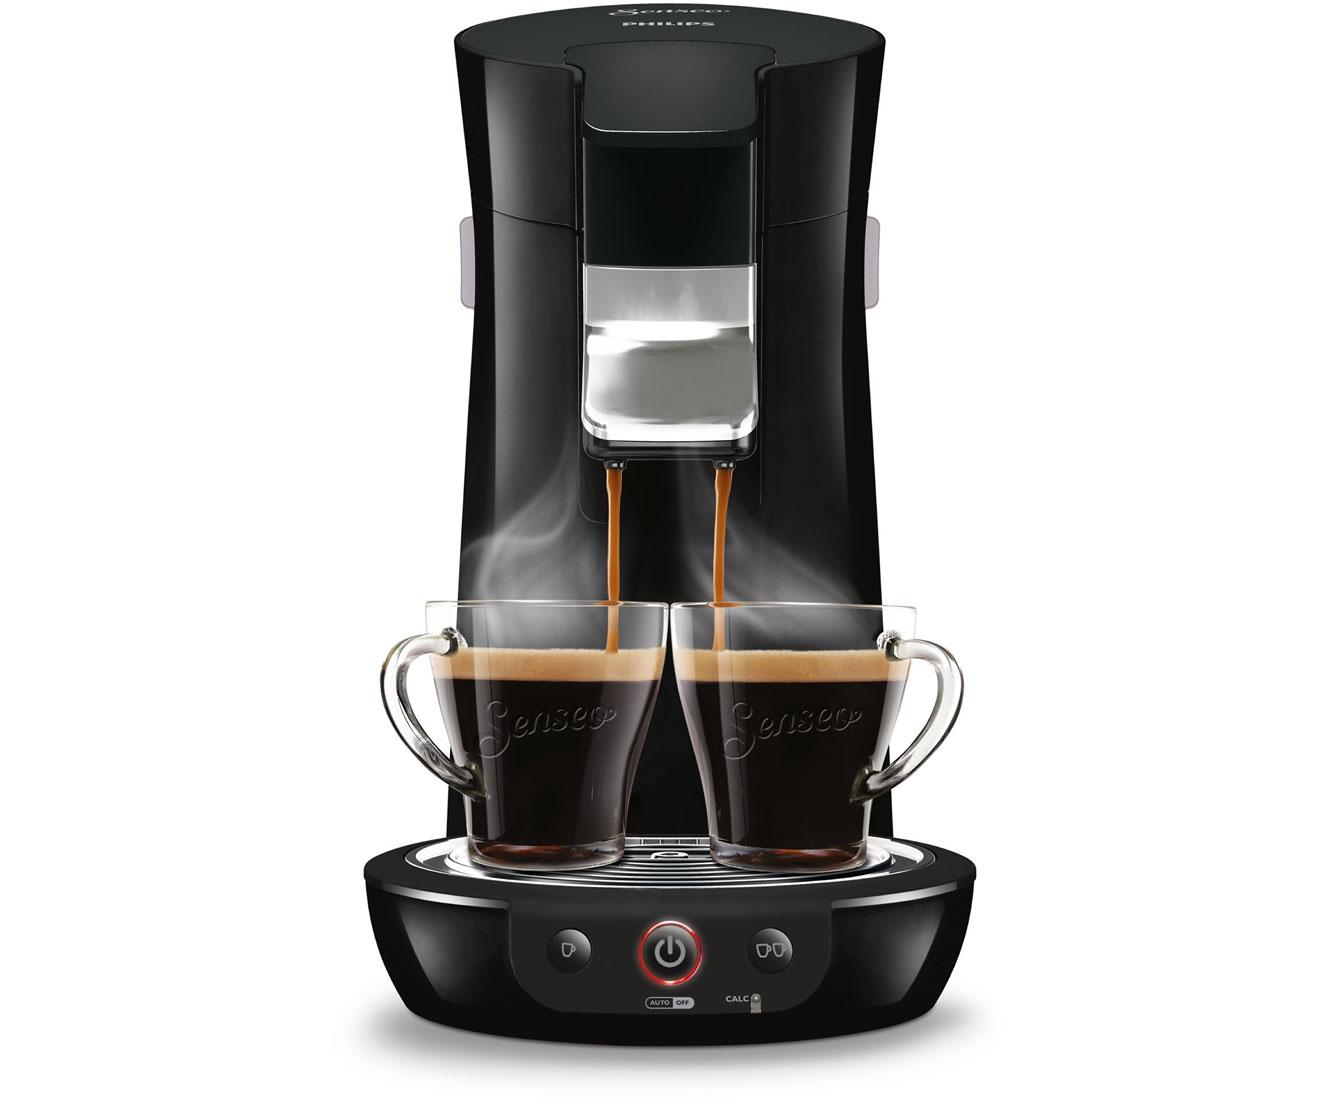 kaffeemaschine severin cafe caprice severin caprice ebay kleinanzeigen severin filterhalter. Black Bedroom Furniture Sets. Home Design Ideas